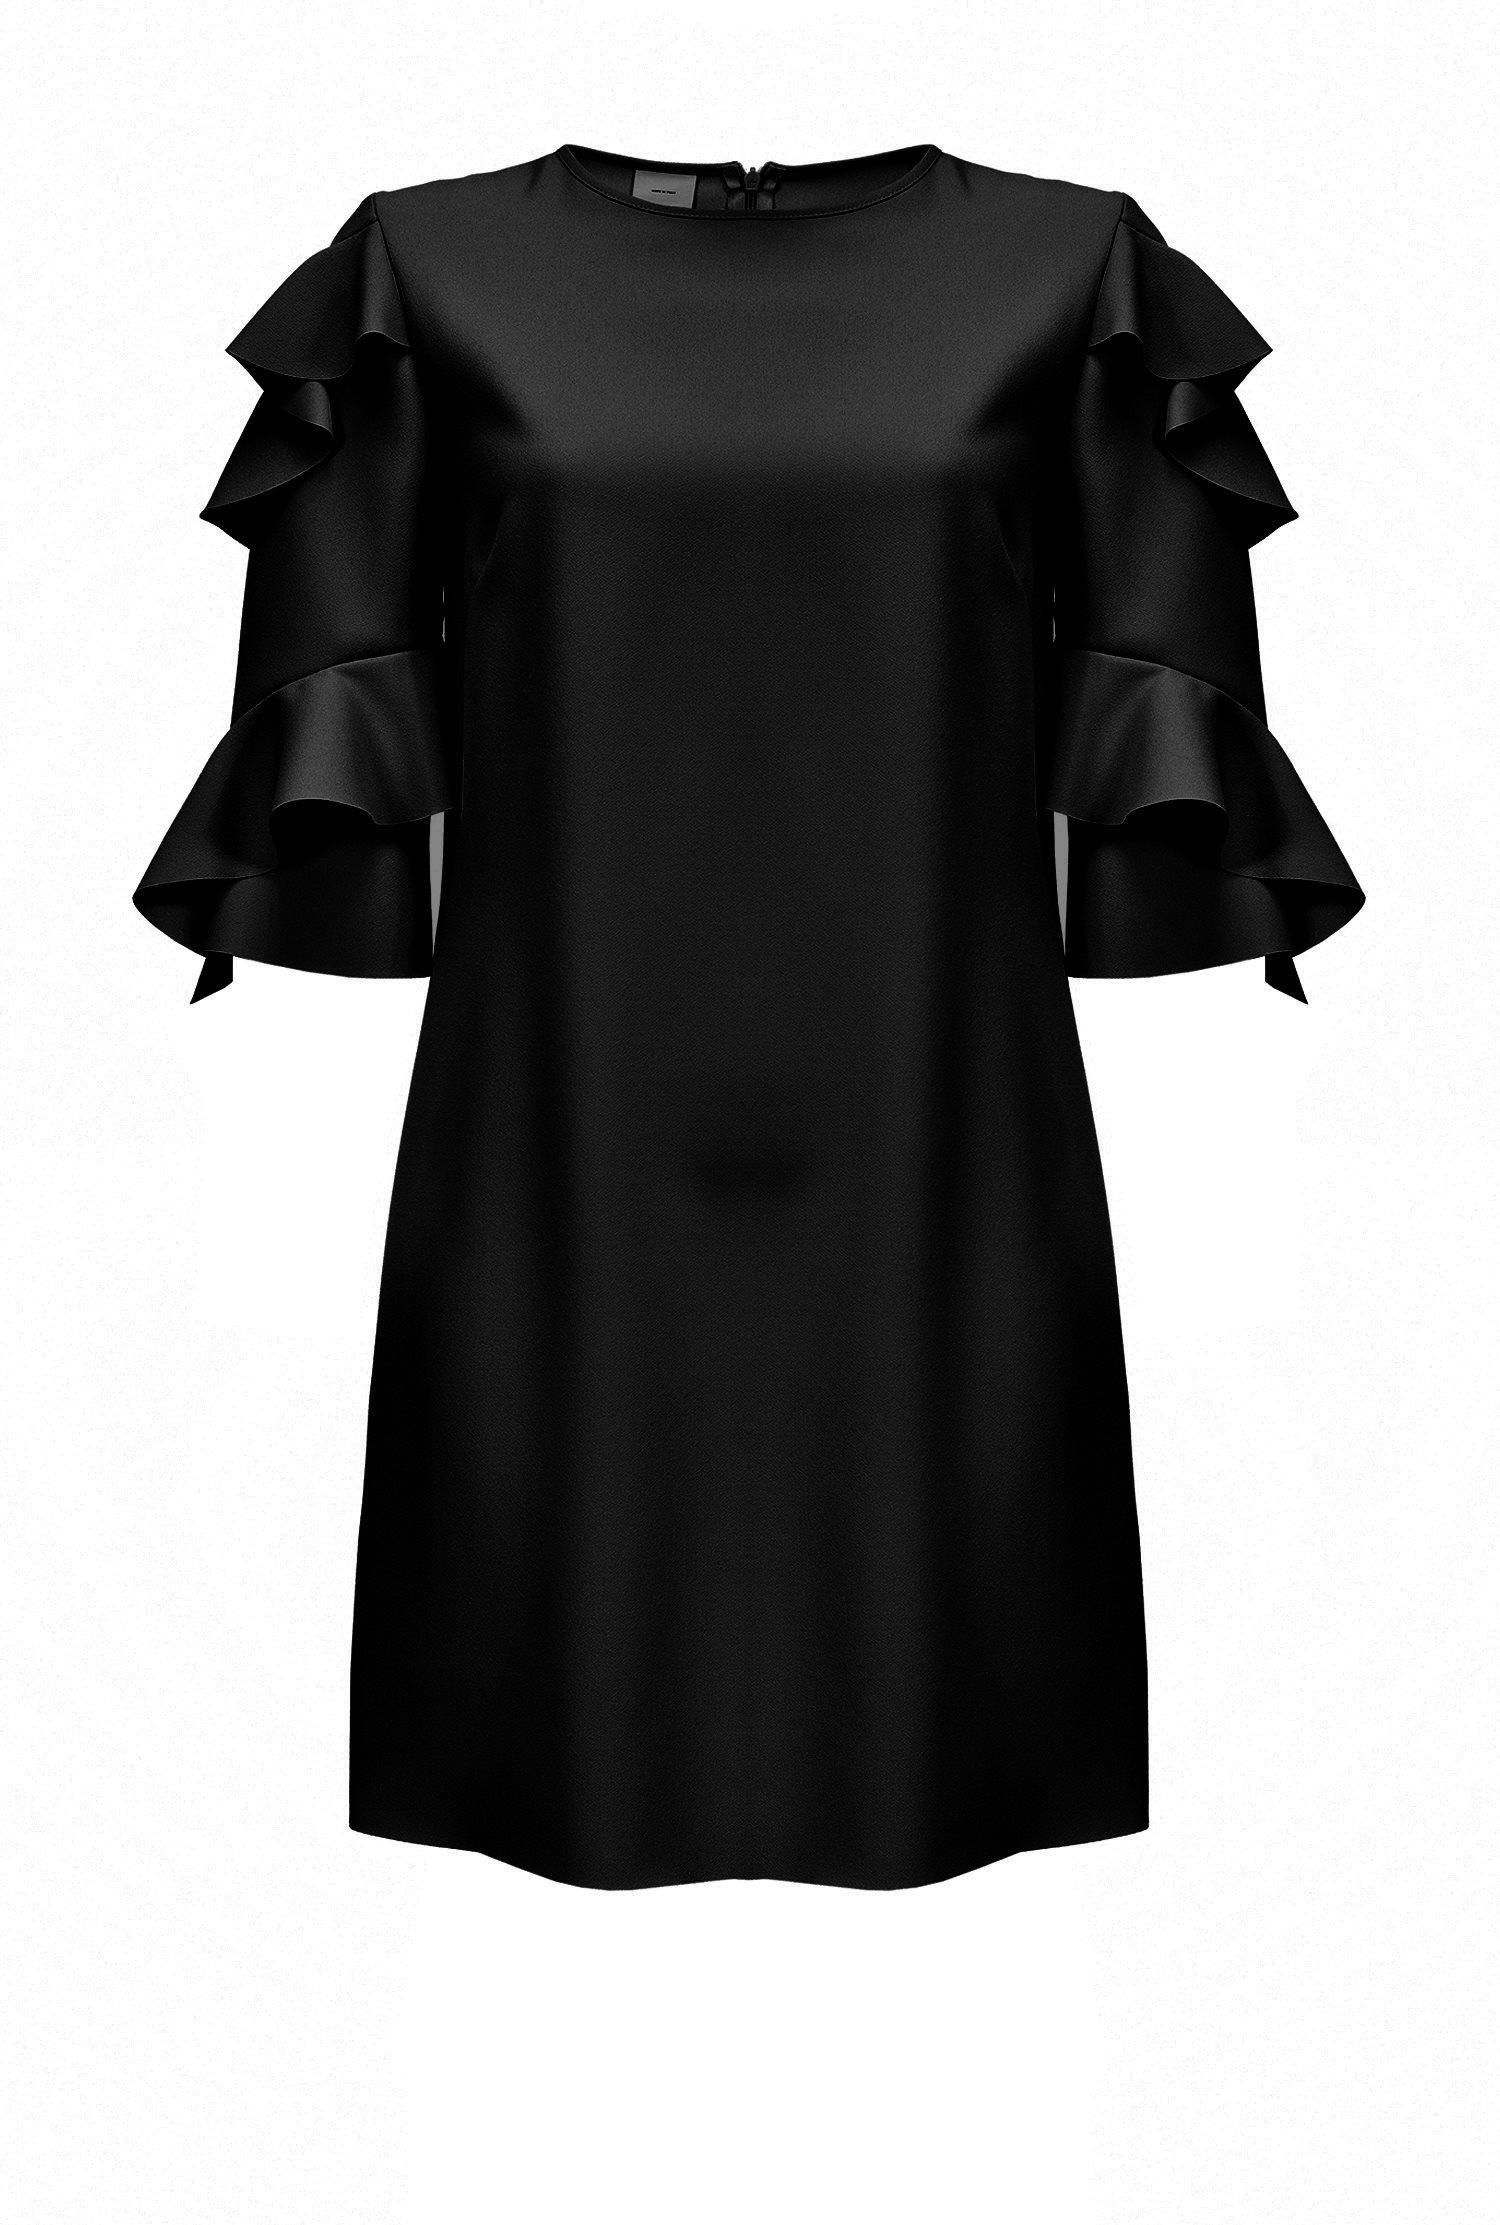 PINKO Spring-Summer 2018 women s crepe dress 4d2eea759fa7